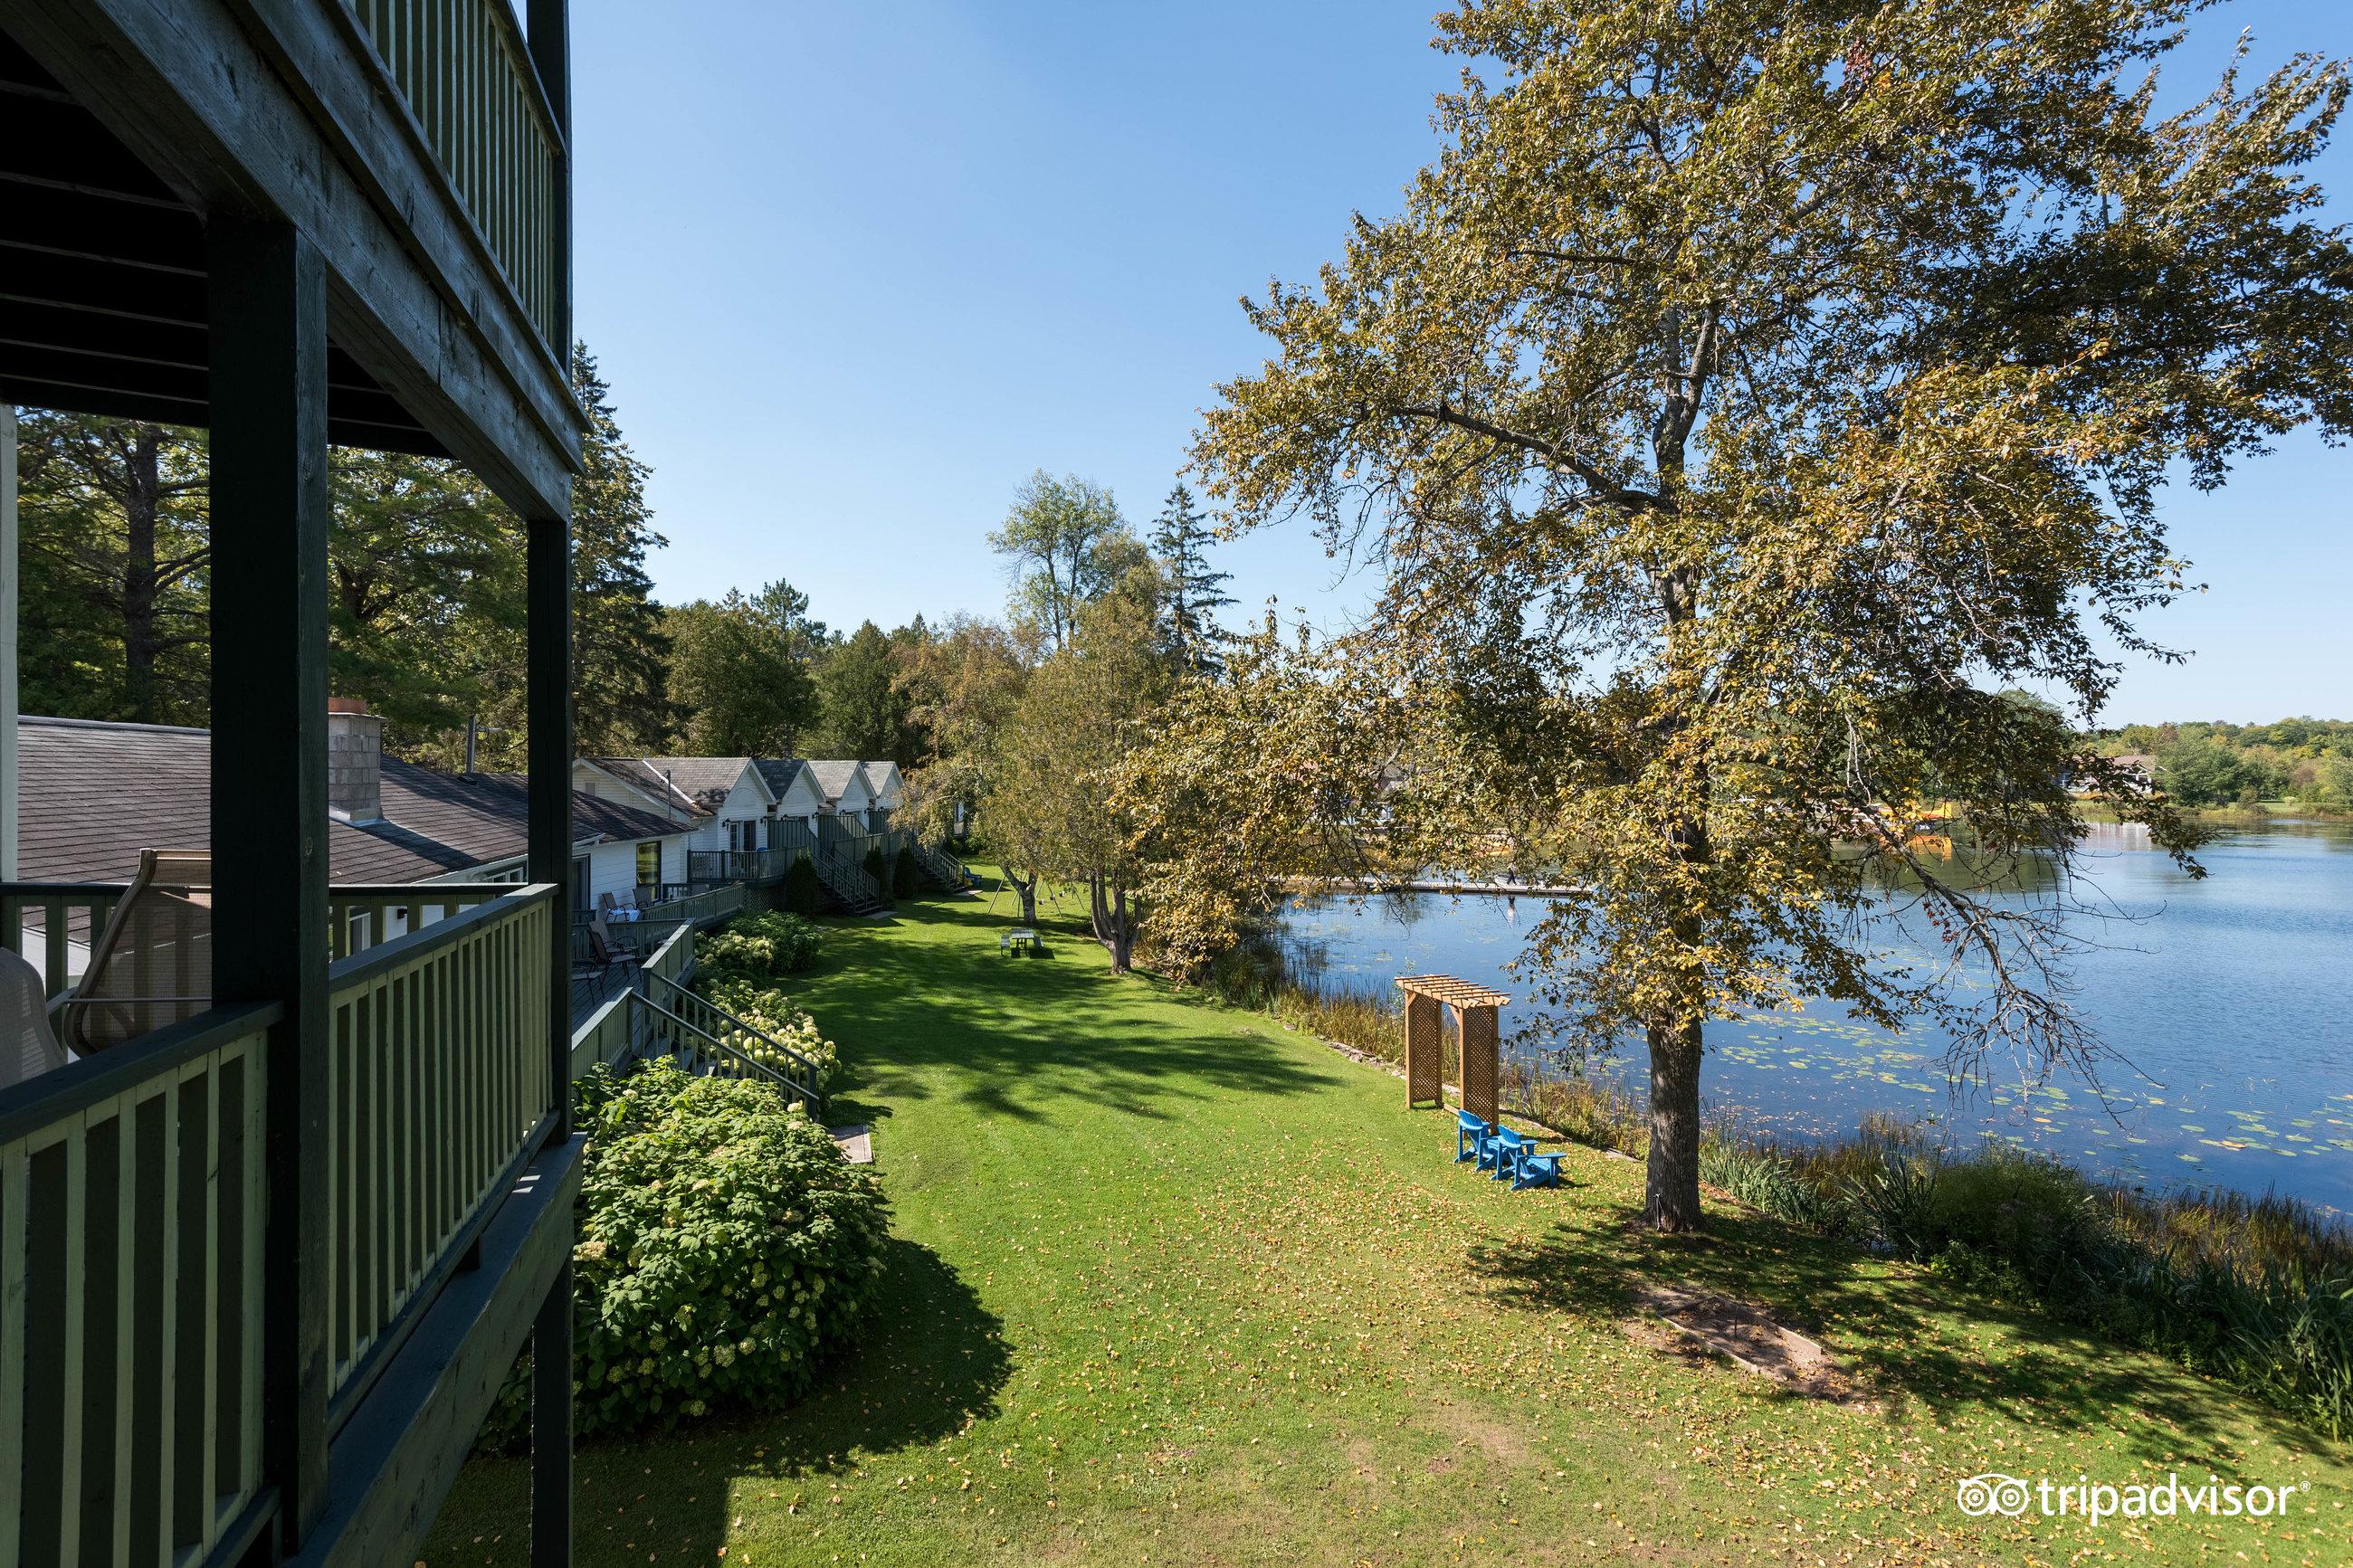 Bayview Wildwood Resort Severn Bridge 2018 Review Amp Ratings Family Vacation Critic